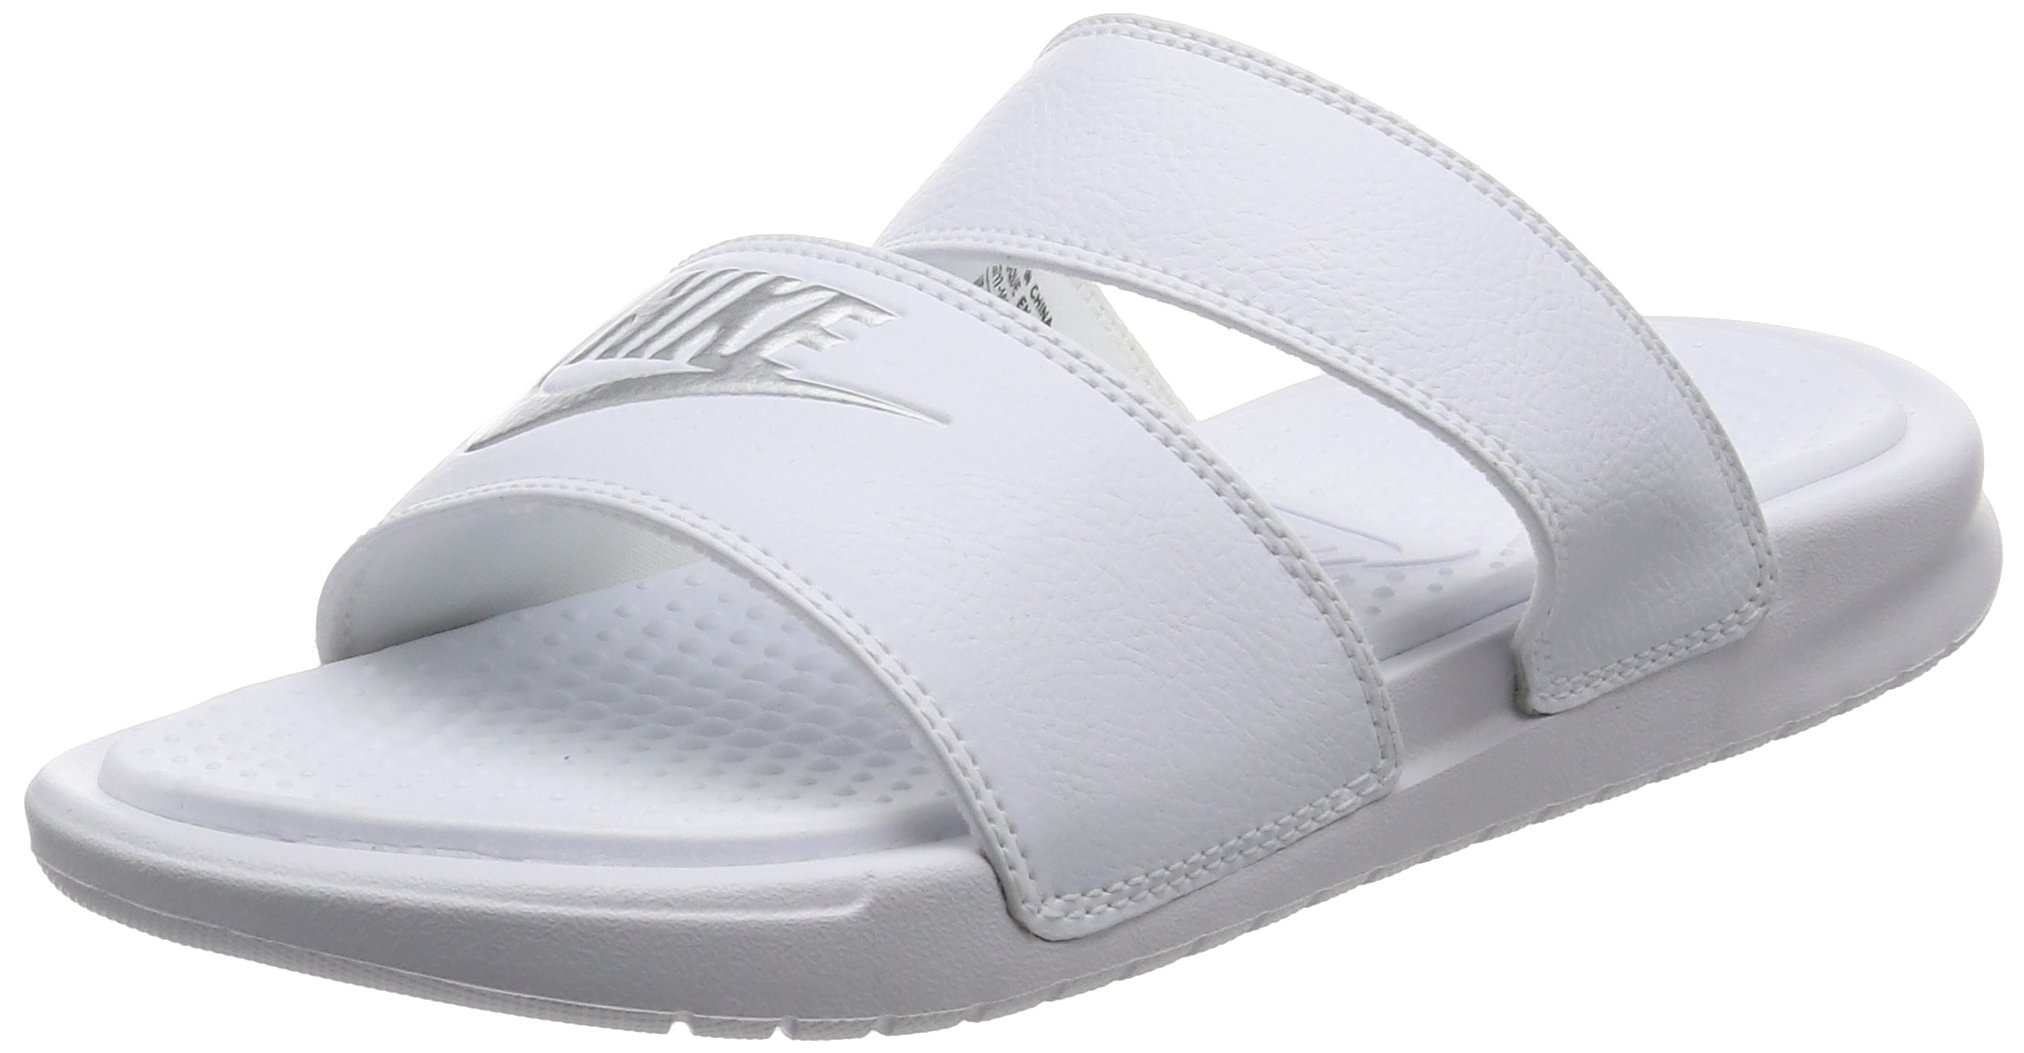 c7017521f99 Galleon - Nike Women s Benassi Duo Ultra Slide Sandal  819717-100 (8) White Metallic  Silver